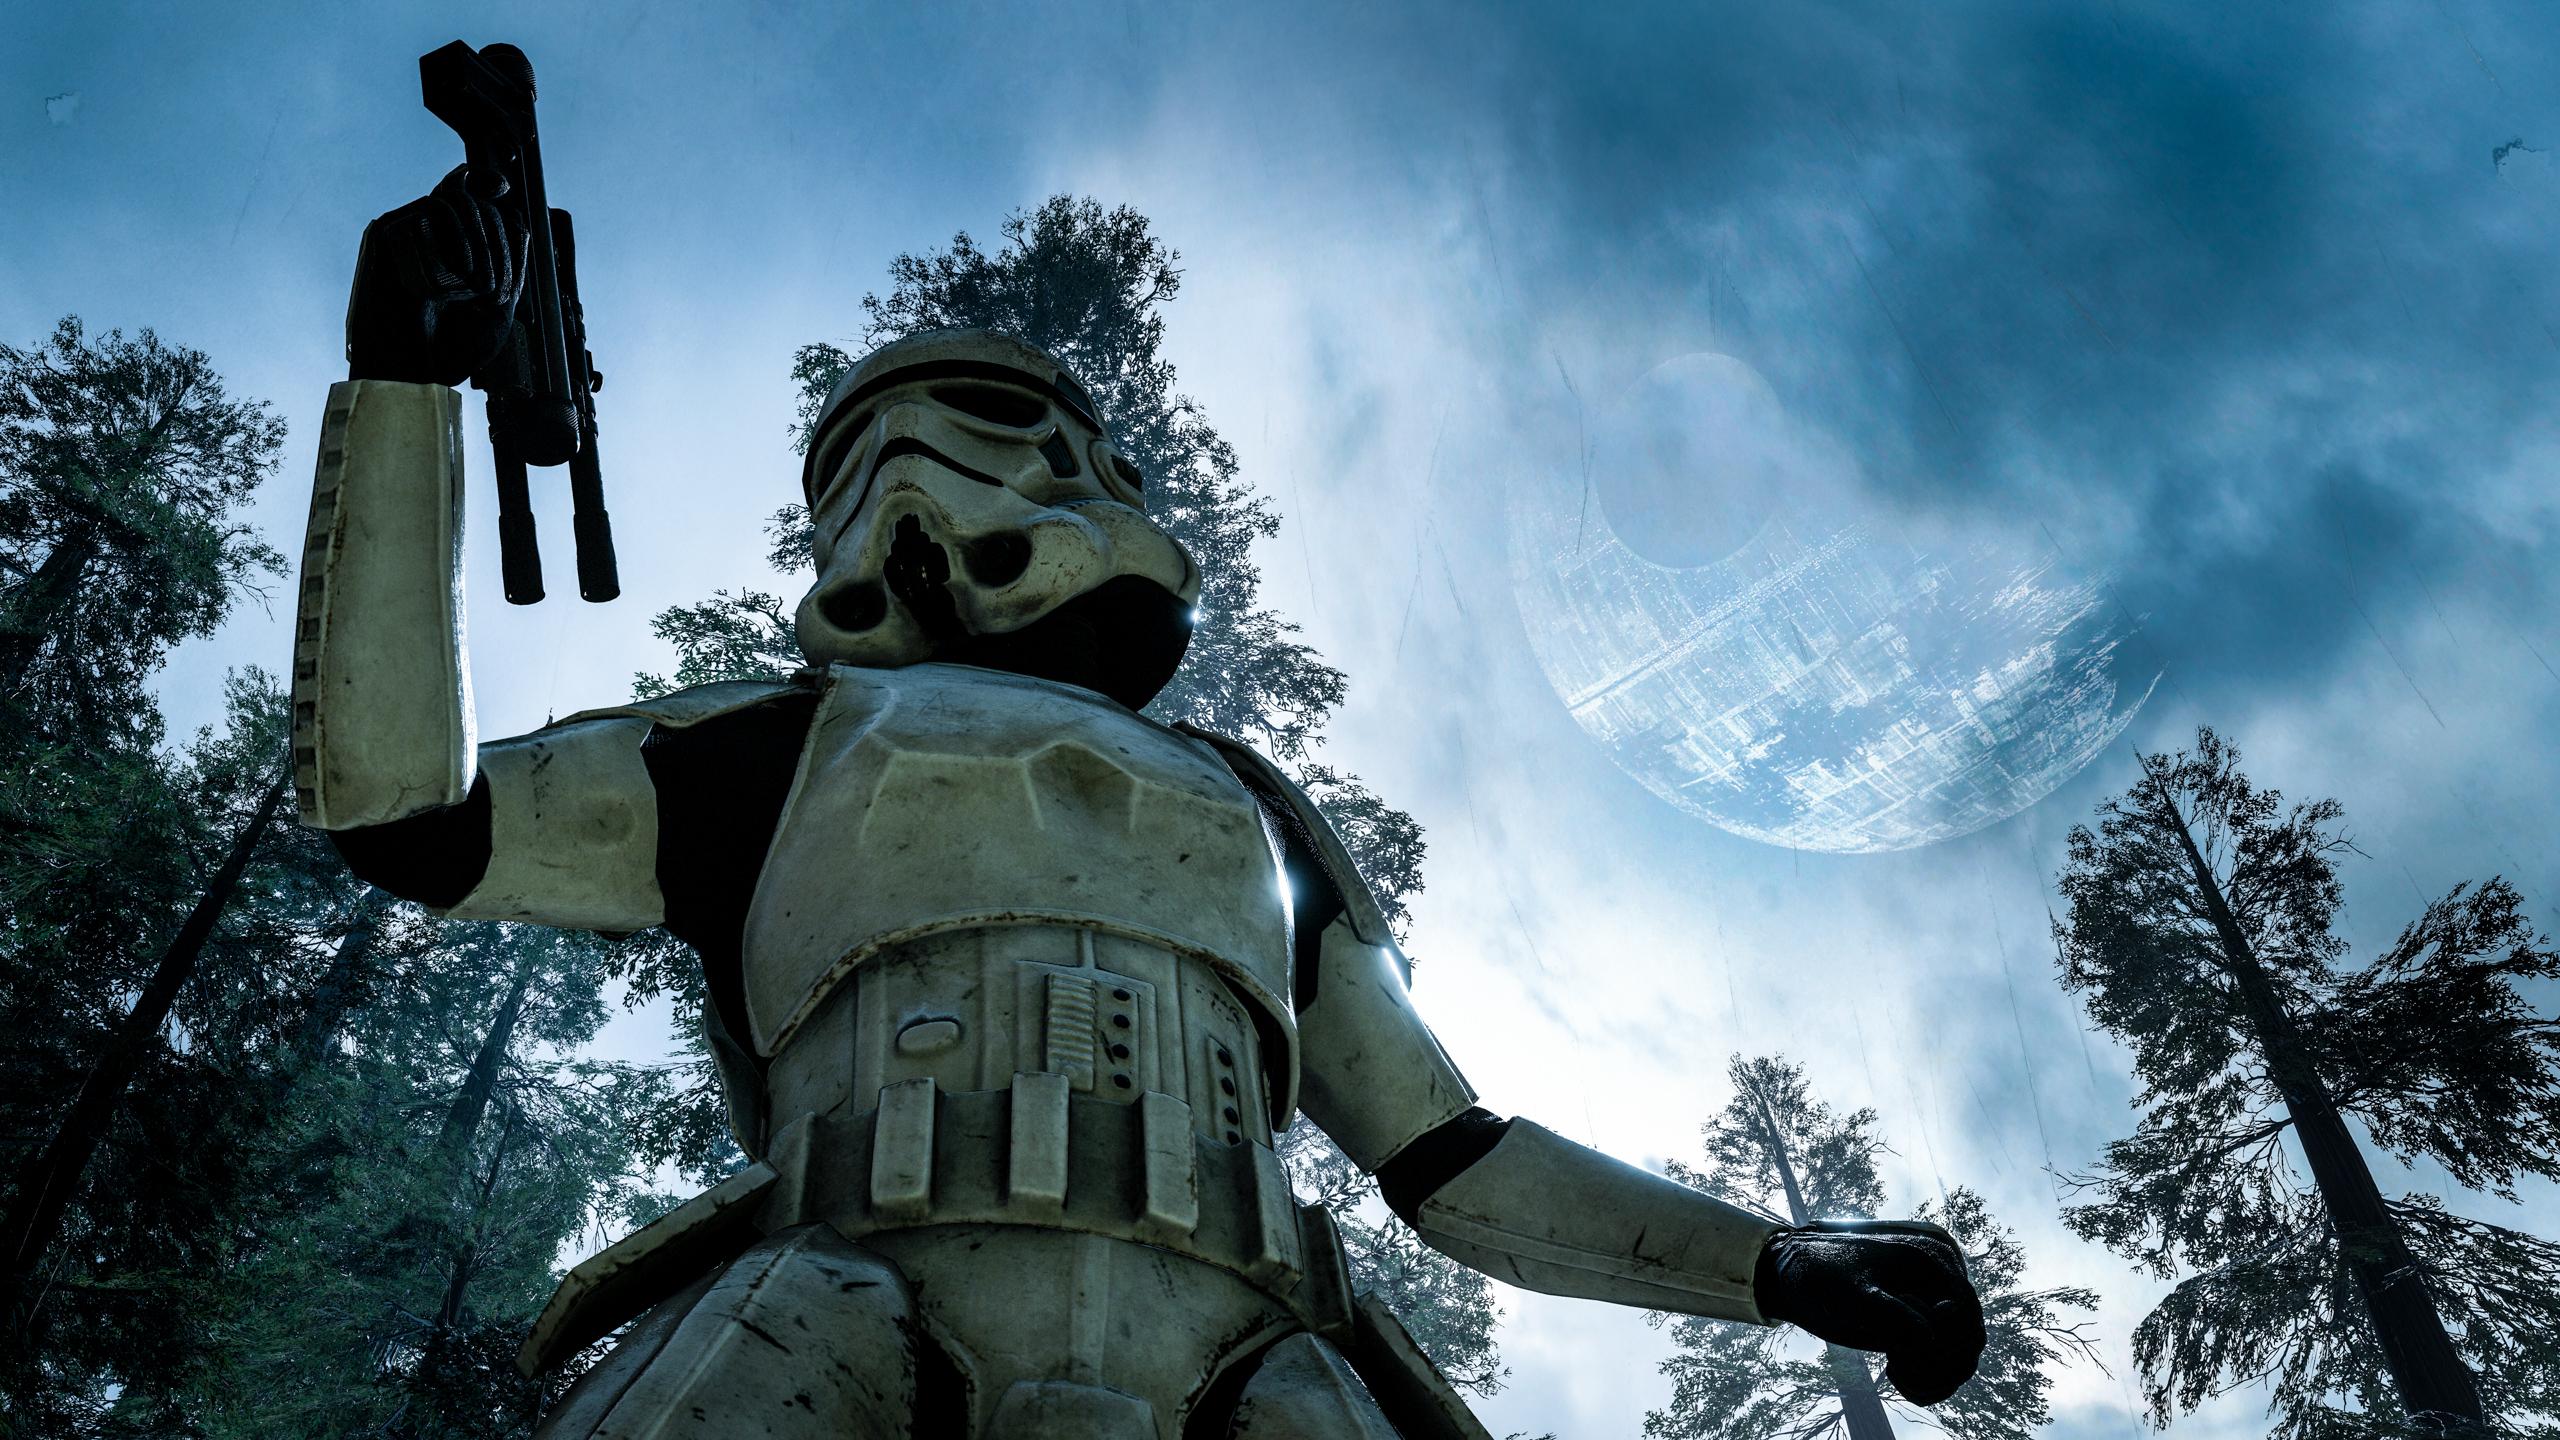 Star Wars Battlefront Backgrounds, Pictures, Images